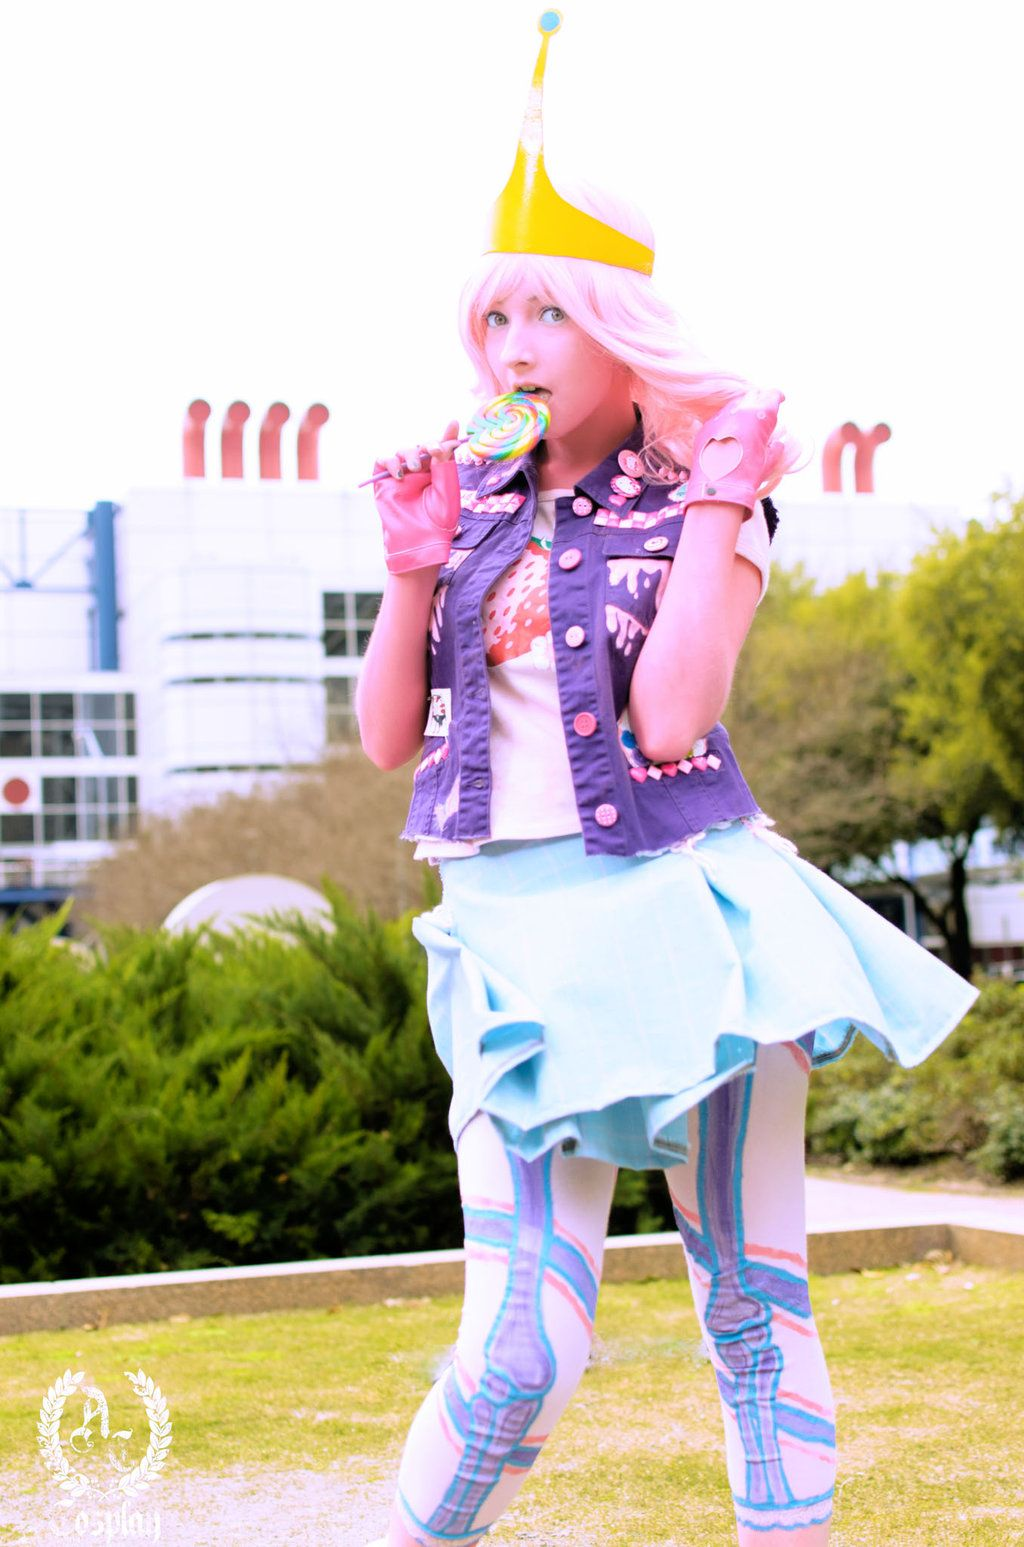 Punk Princess Bubblegum by Evettesniche.deviantart.com on @DeviantArt